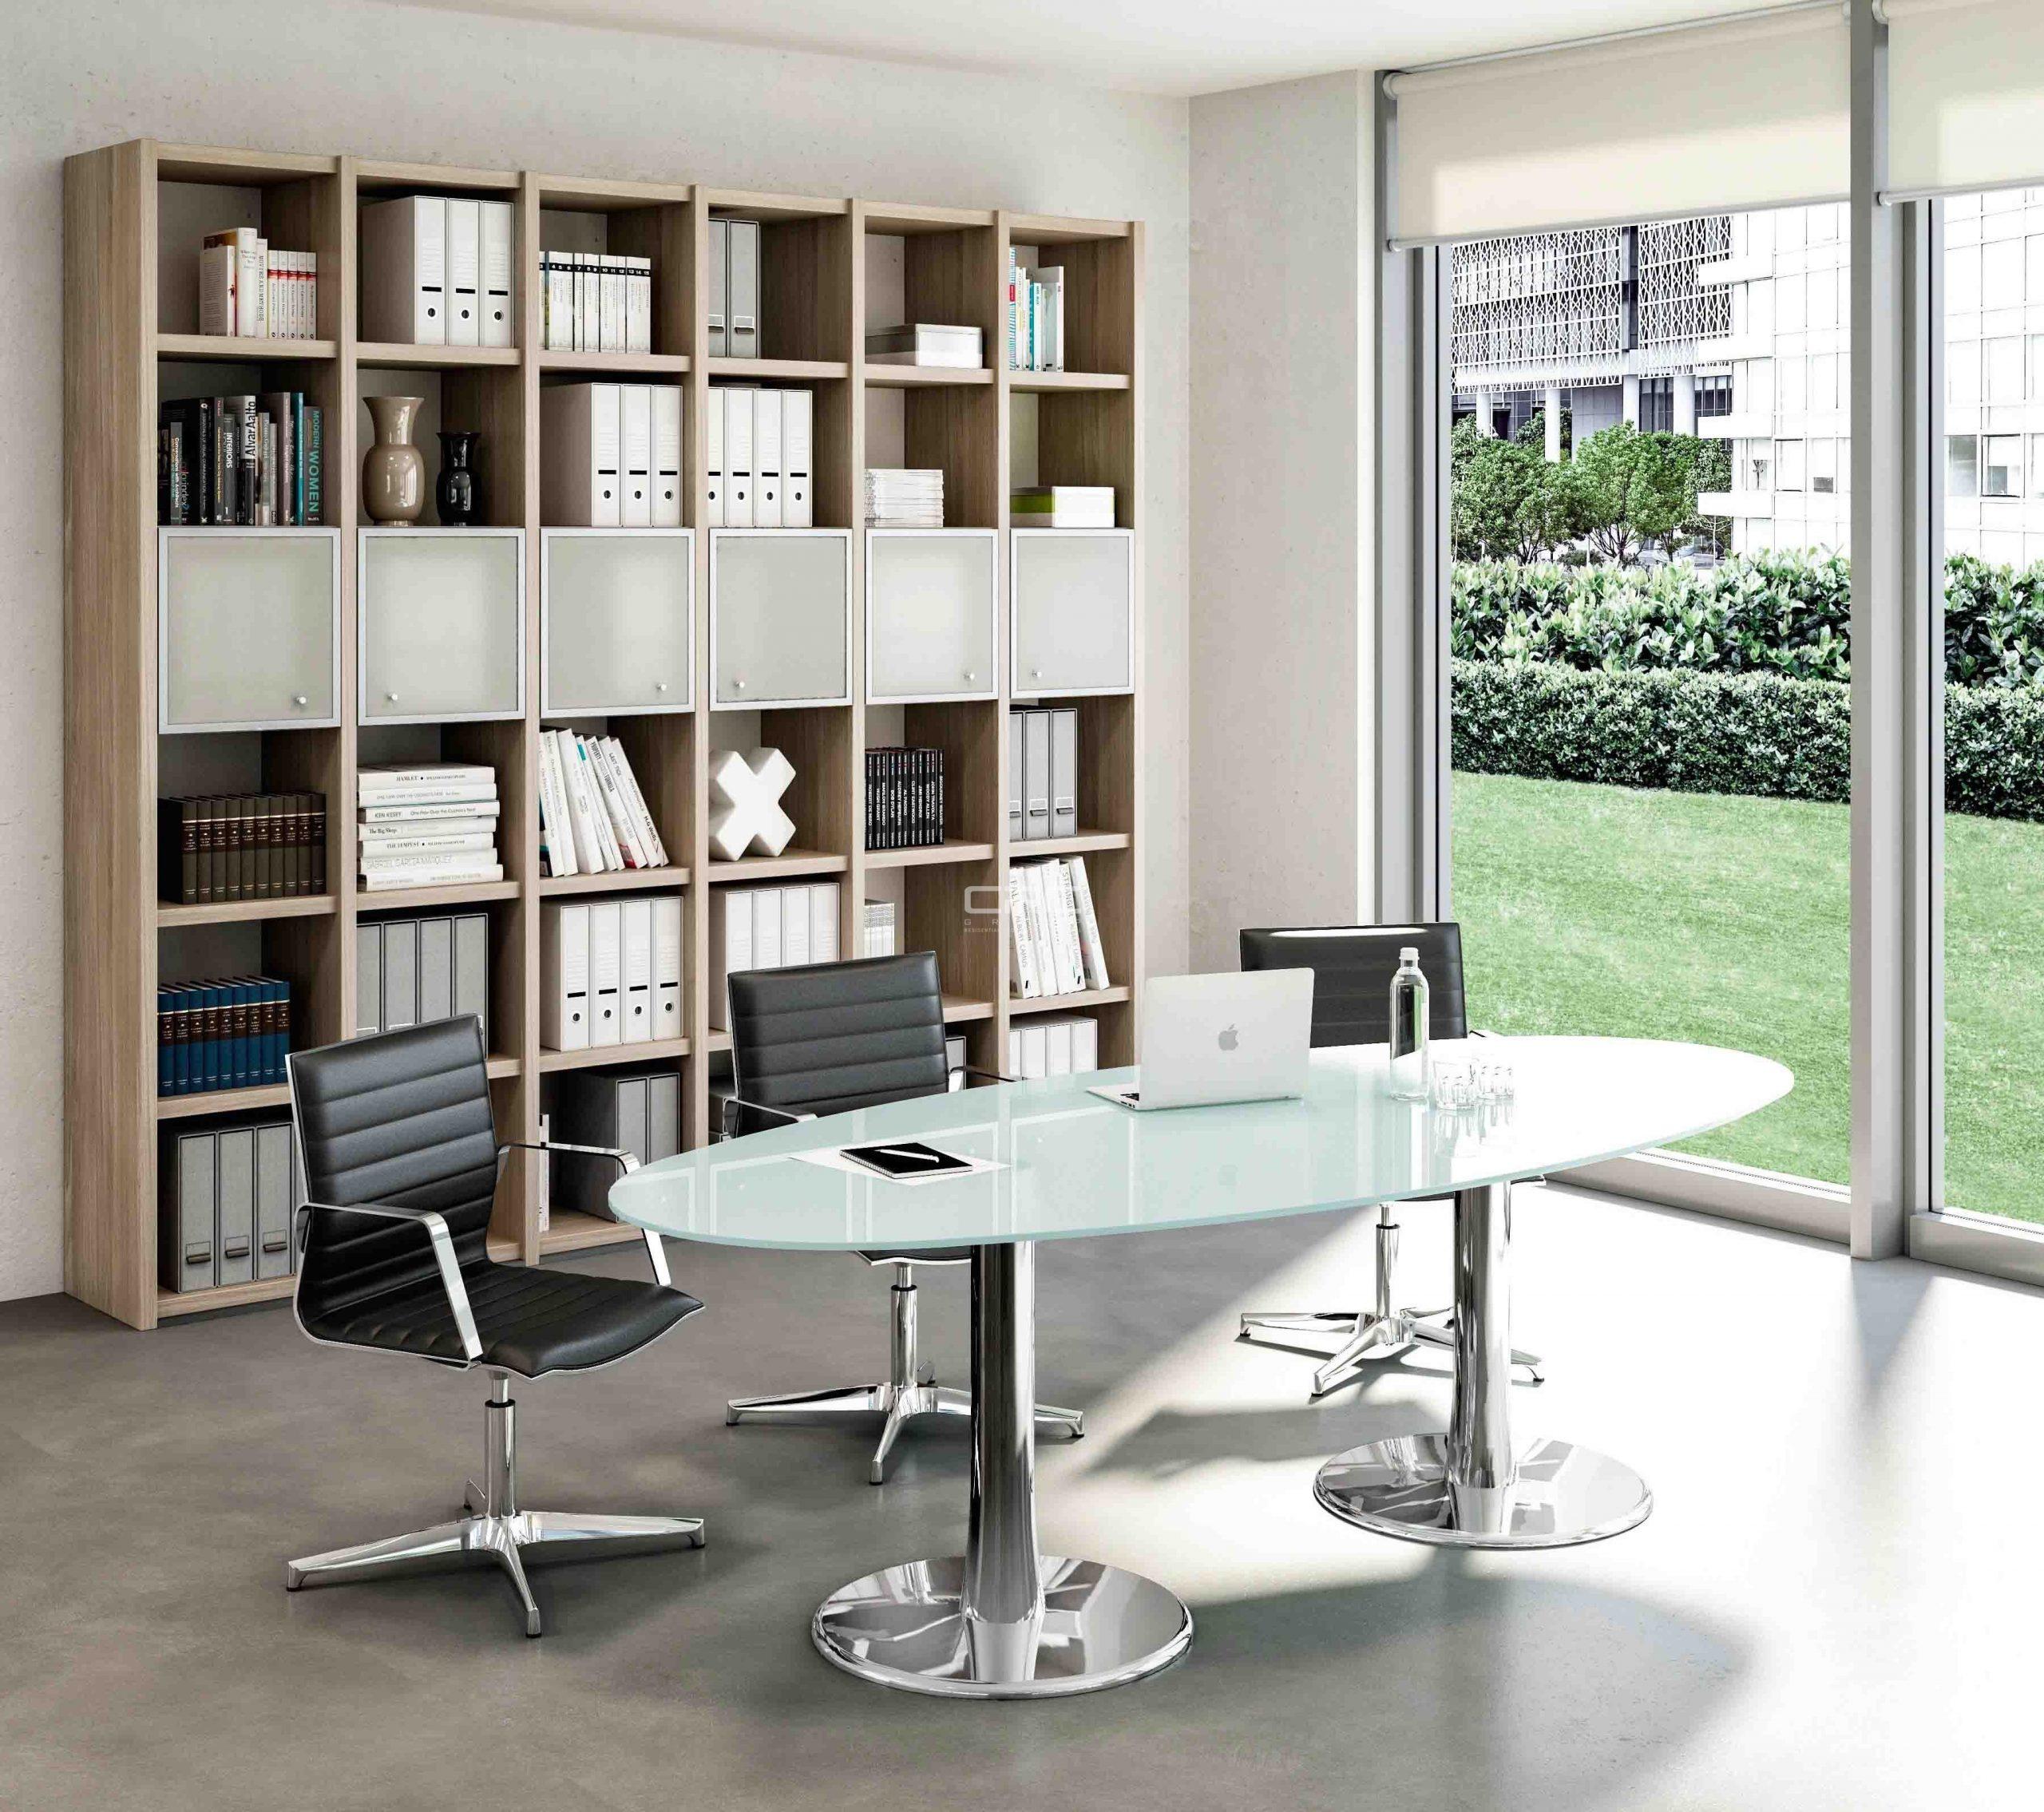 Quadrifoglio Xtime meeting table